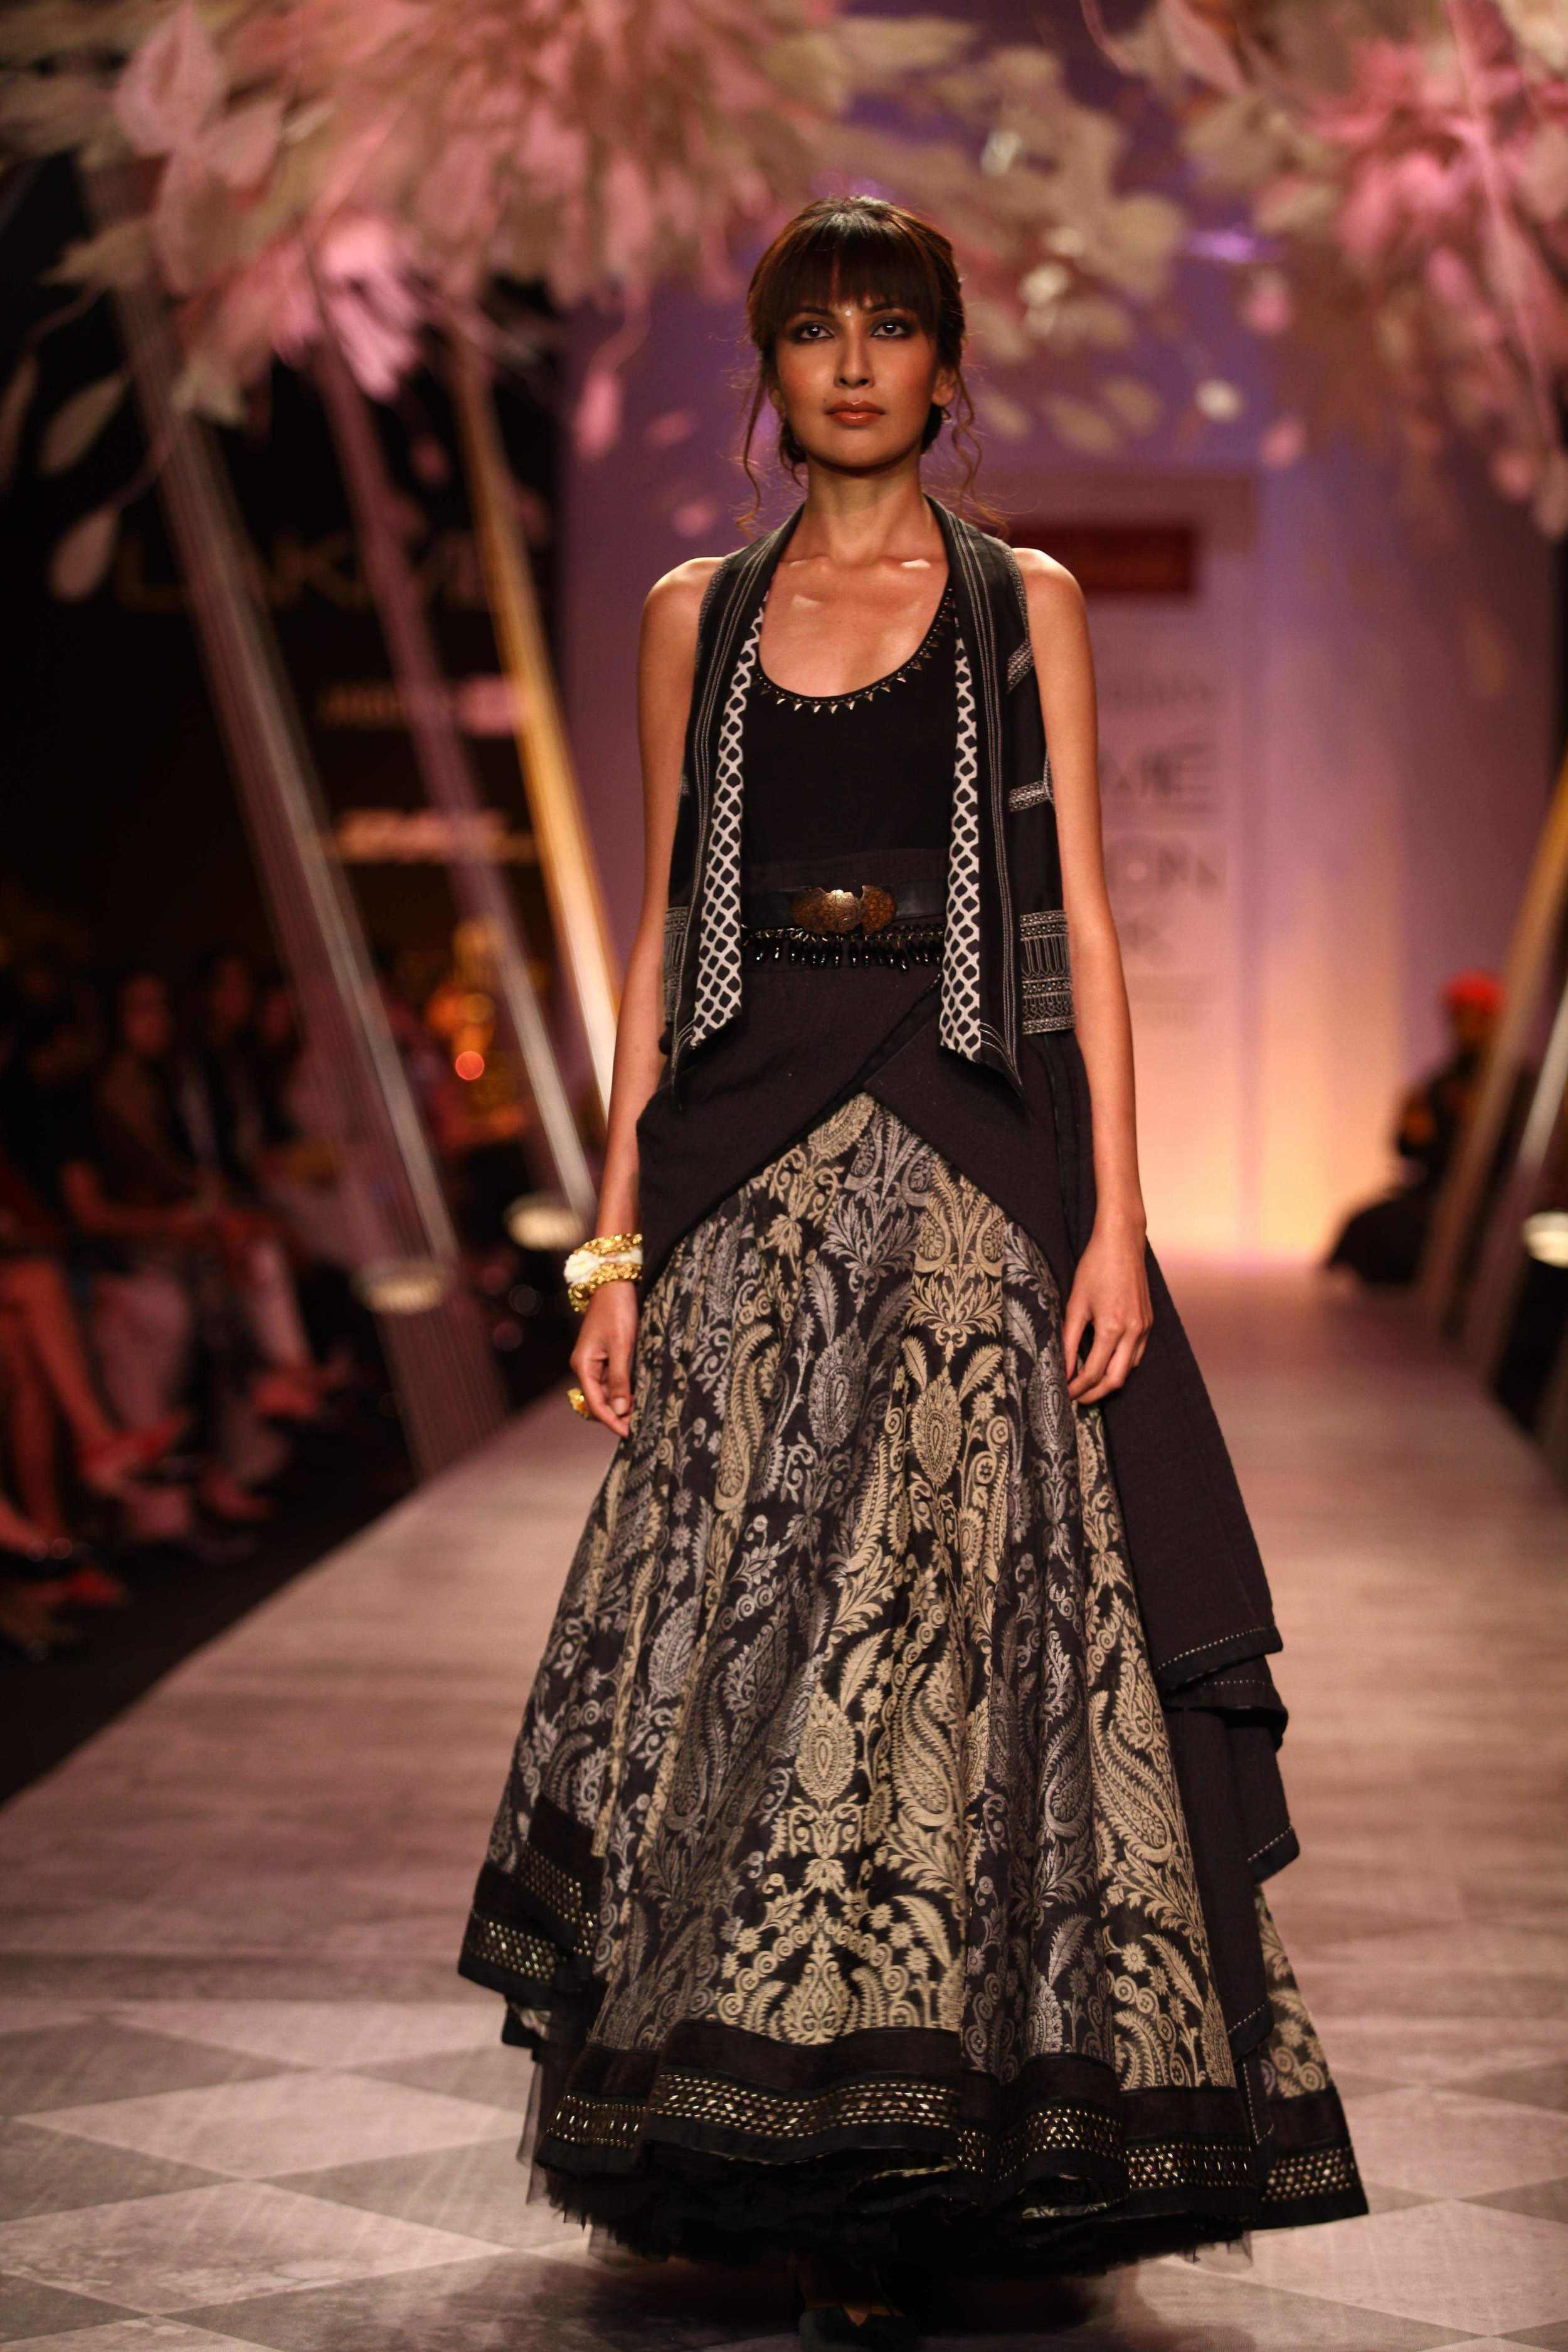 Tarun Tahiliani SS'14 Collection at LFW SR 2014 10.jpg